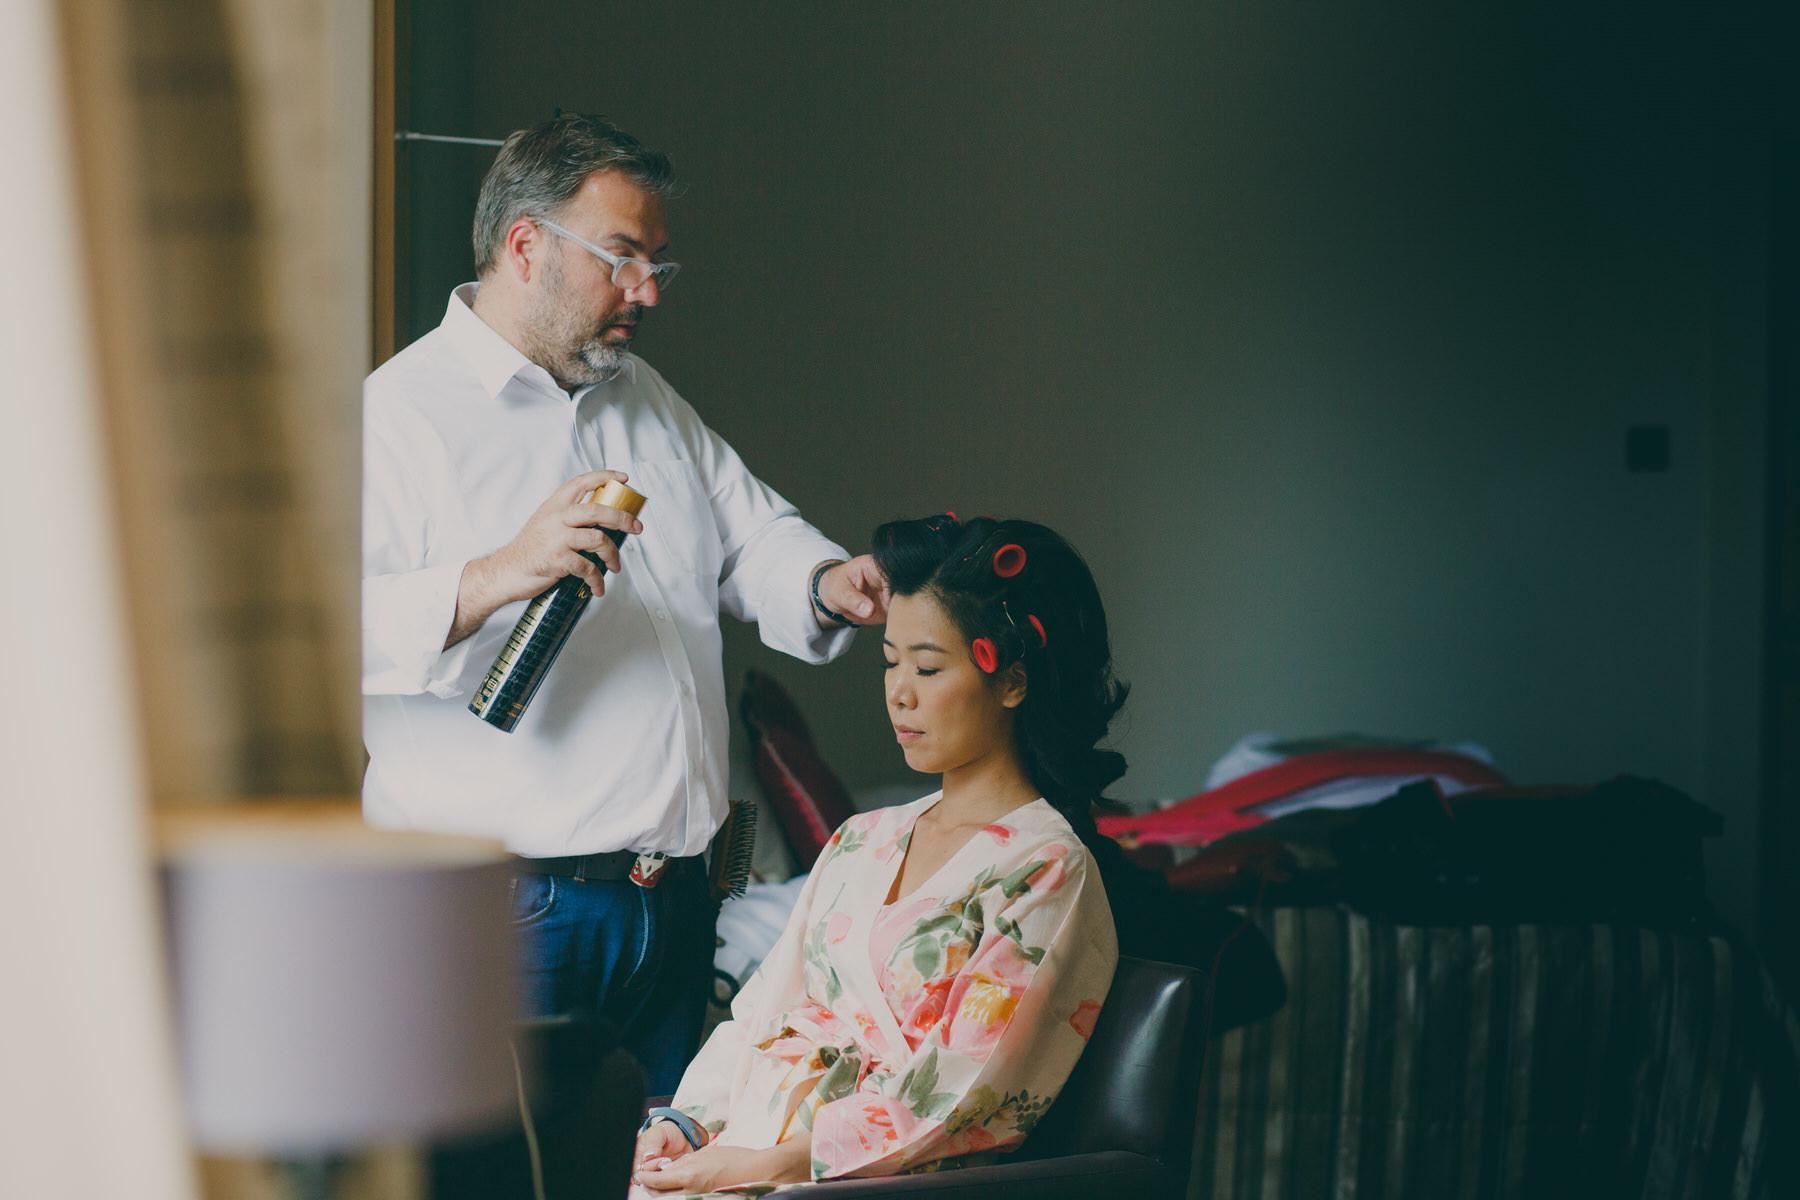 28 Woodlands Hotel Severin Hubert doing brides hair.jpg